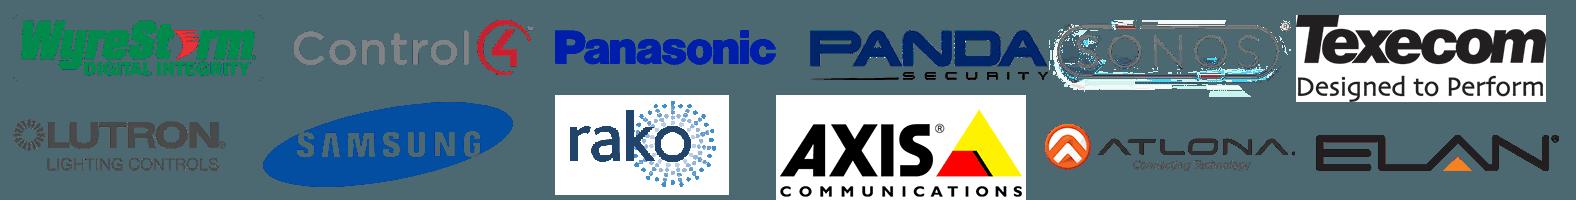 sponsored partners